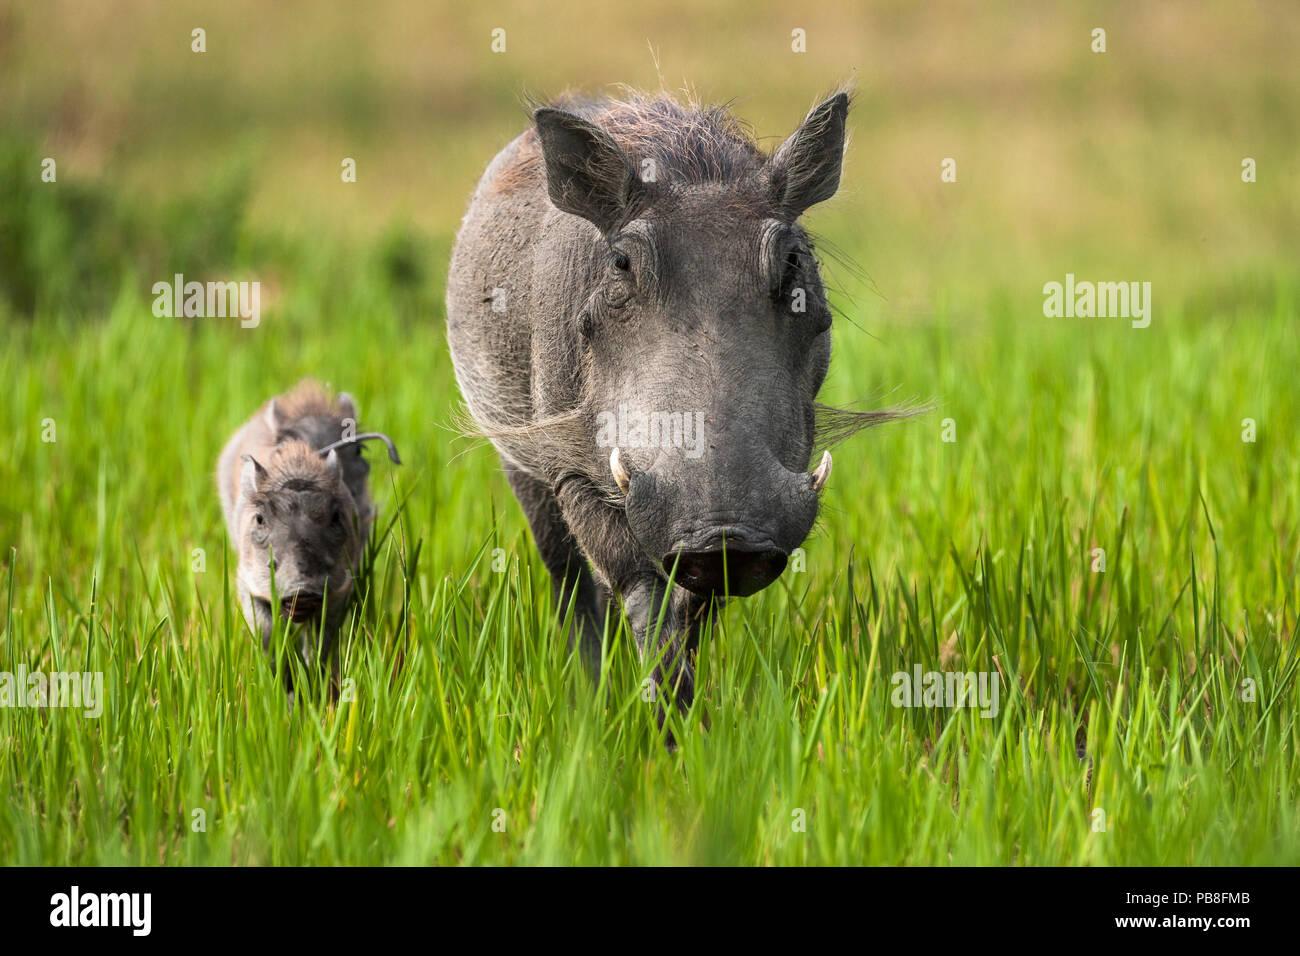 Warthog (Phacochoerus aethiopicus) female with piglets, Okavango Delta, Botswana - Stock Image